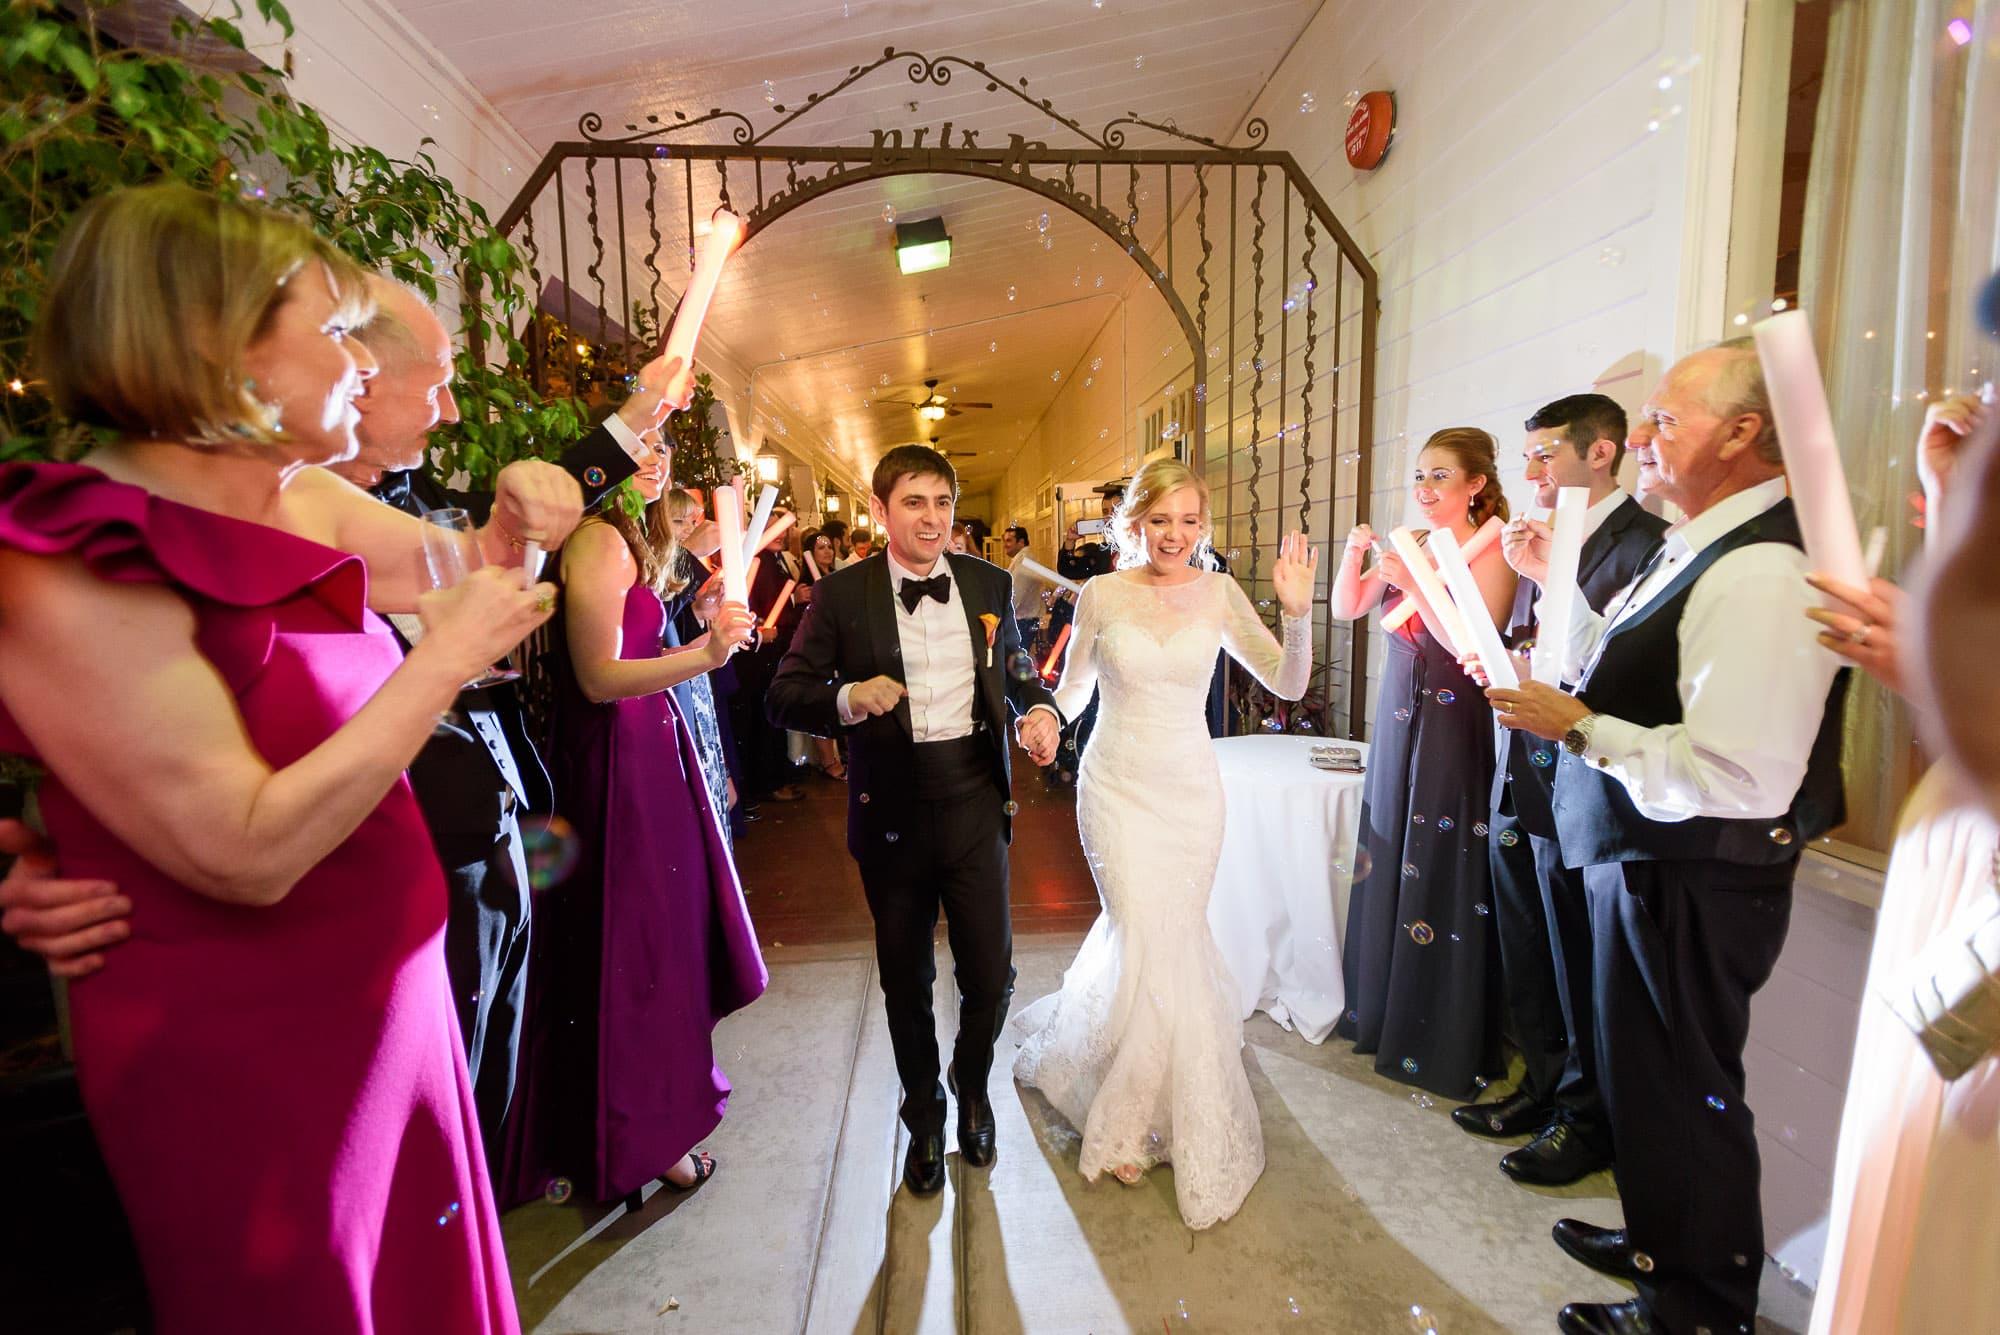 078_Alan_and_Heidi_Los_Angeles_Equestrian_Center_Wedding